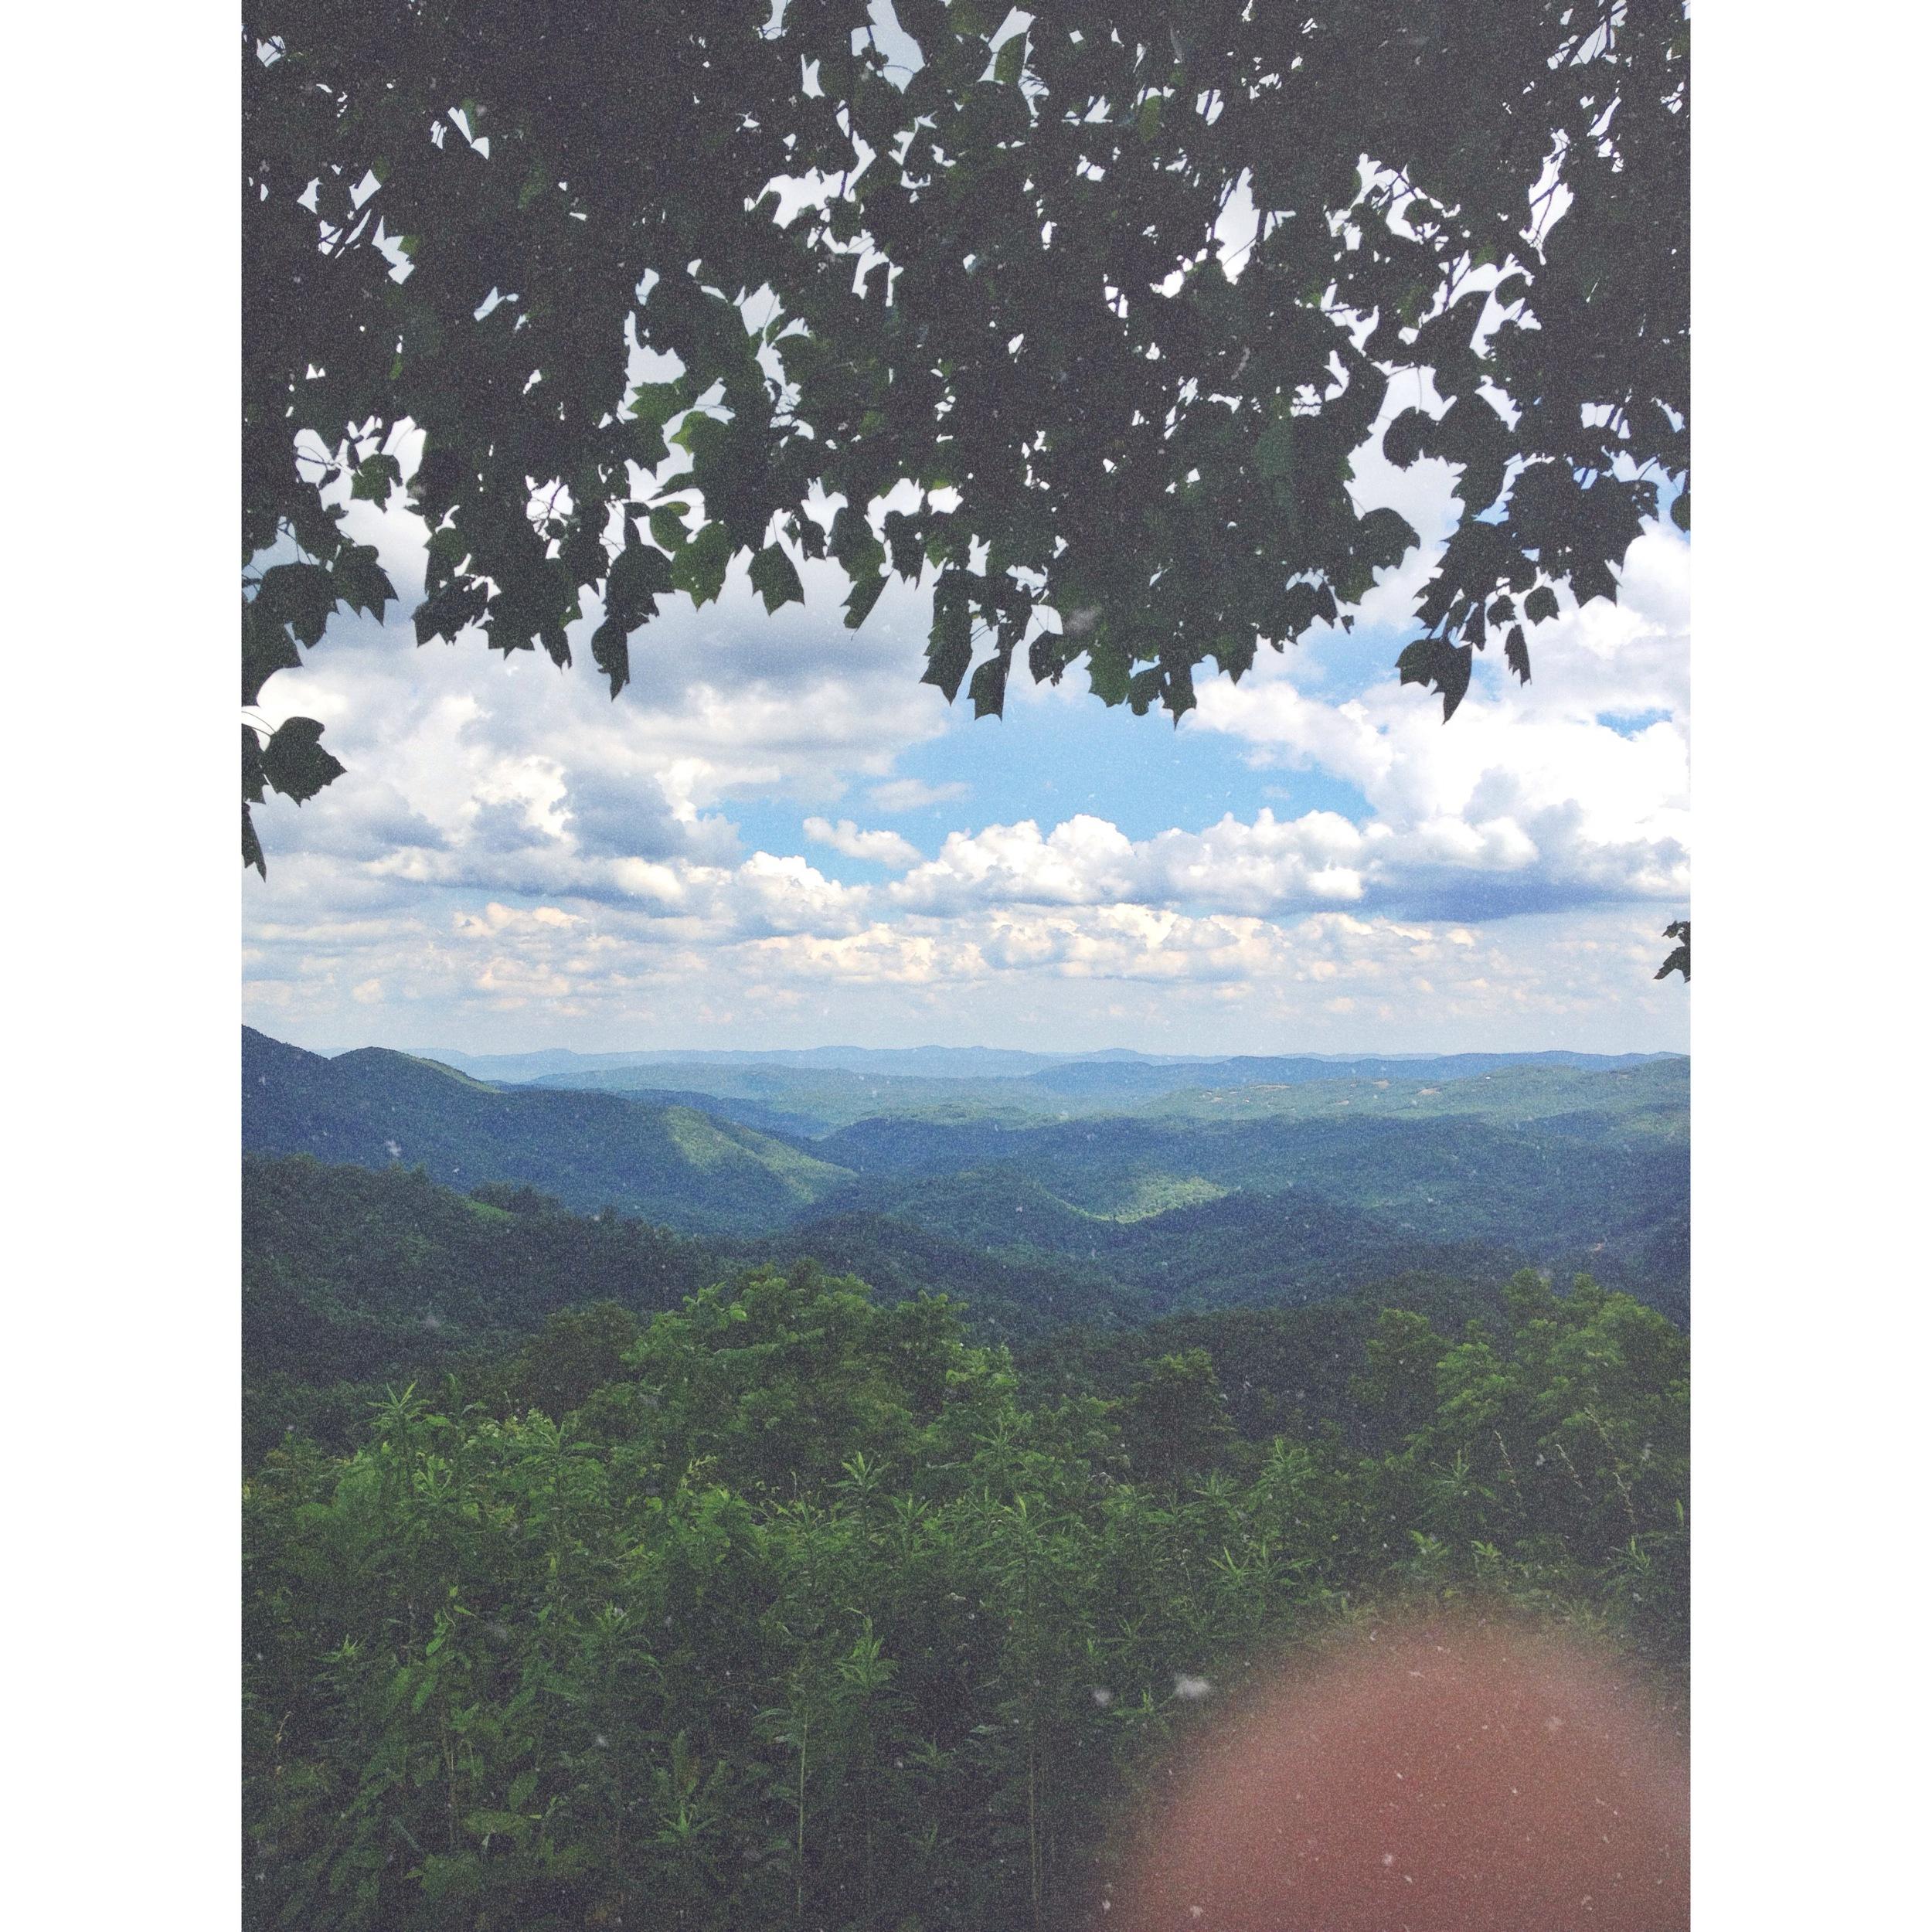 Blue Ridge Mountains, Summer 2013